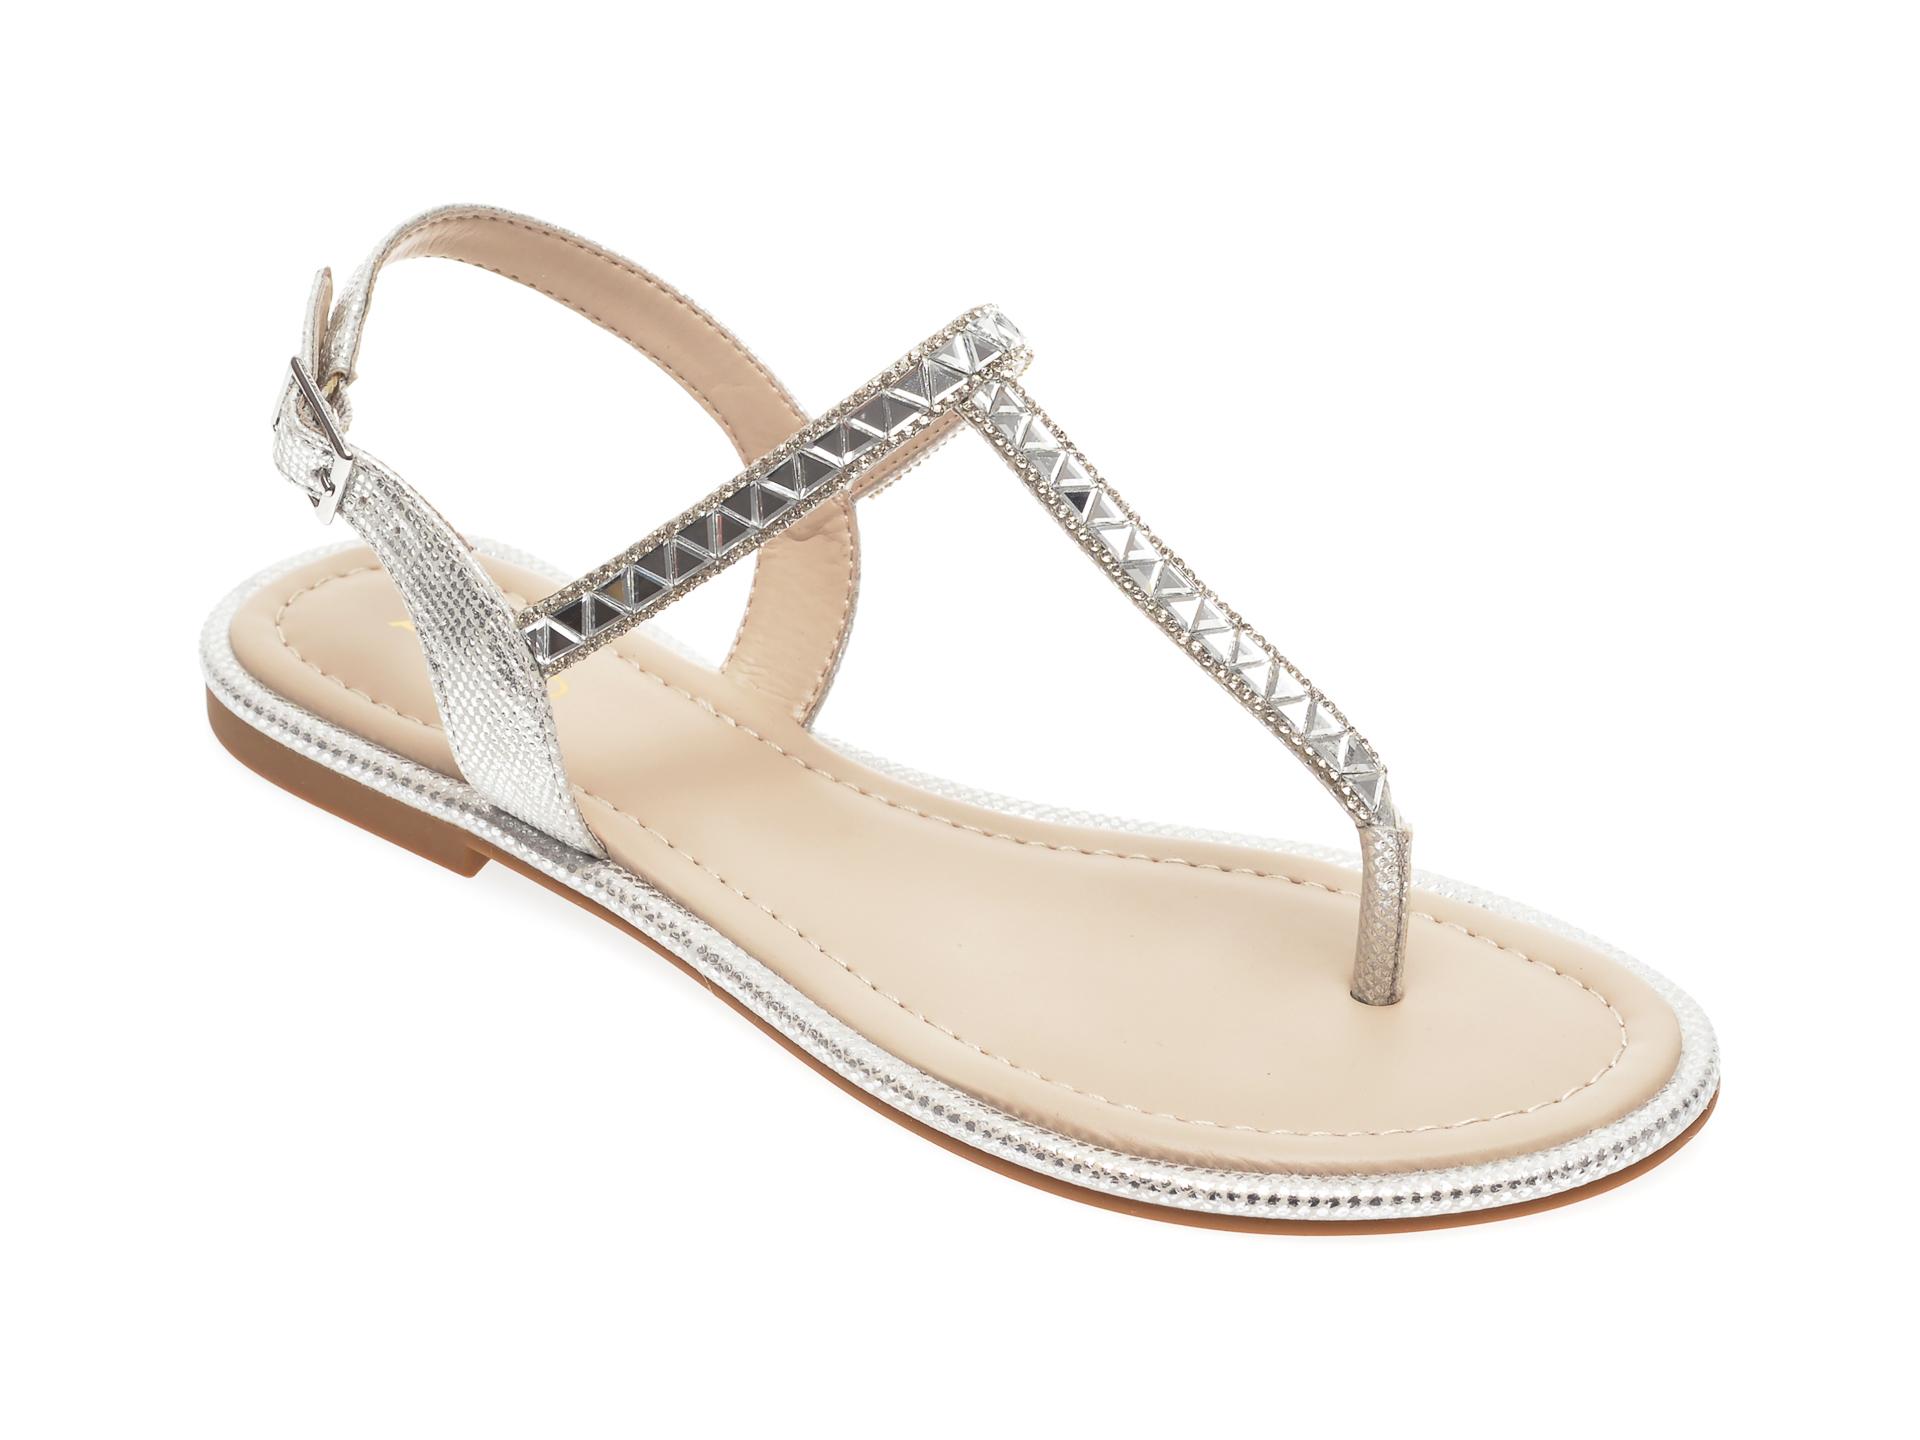 Sandale ALDO argintii, Sheeny040, din piele ecologica